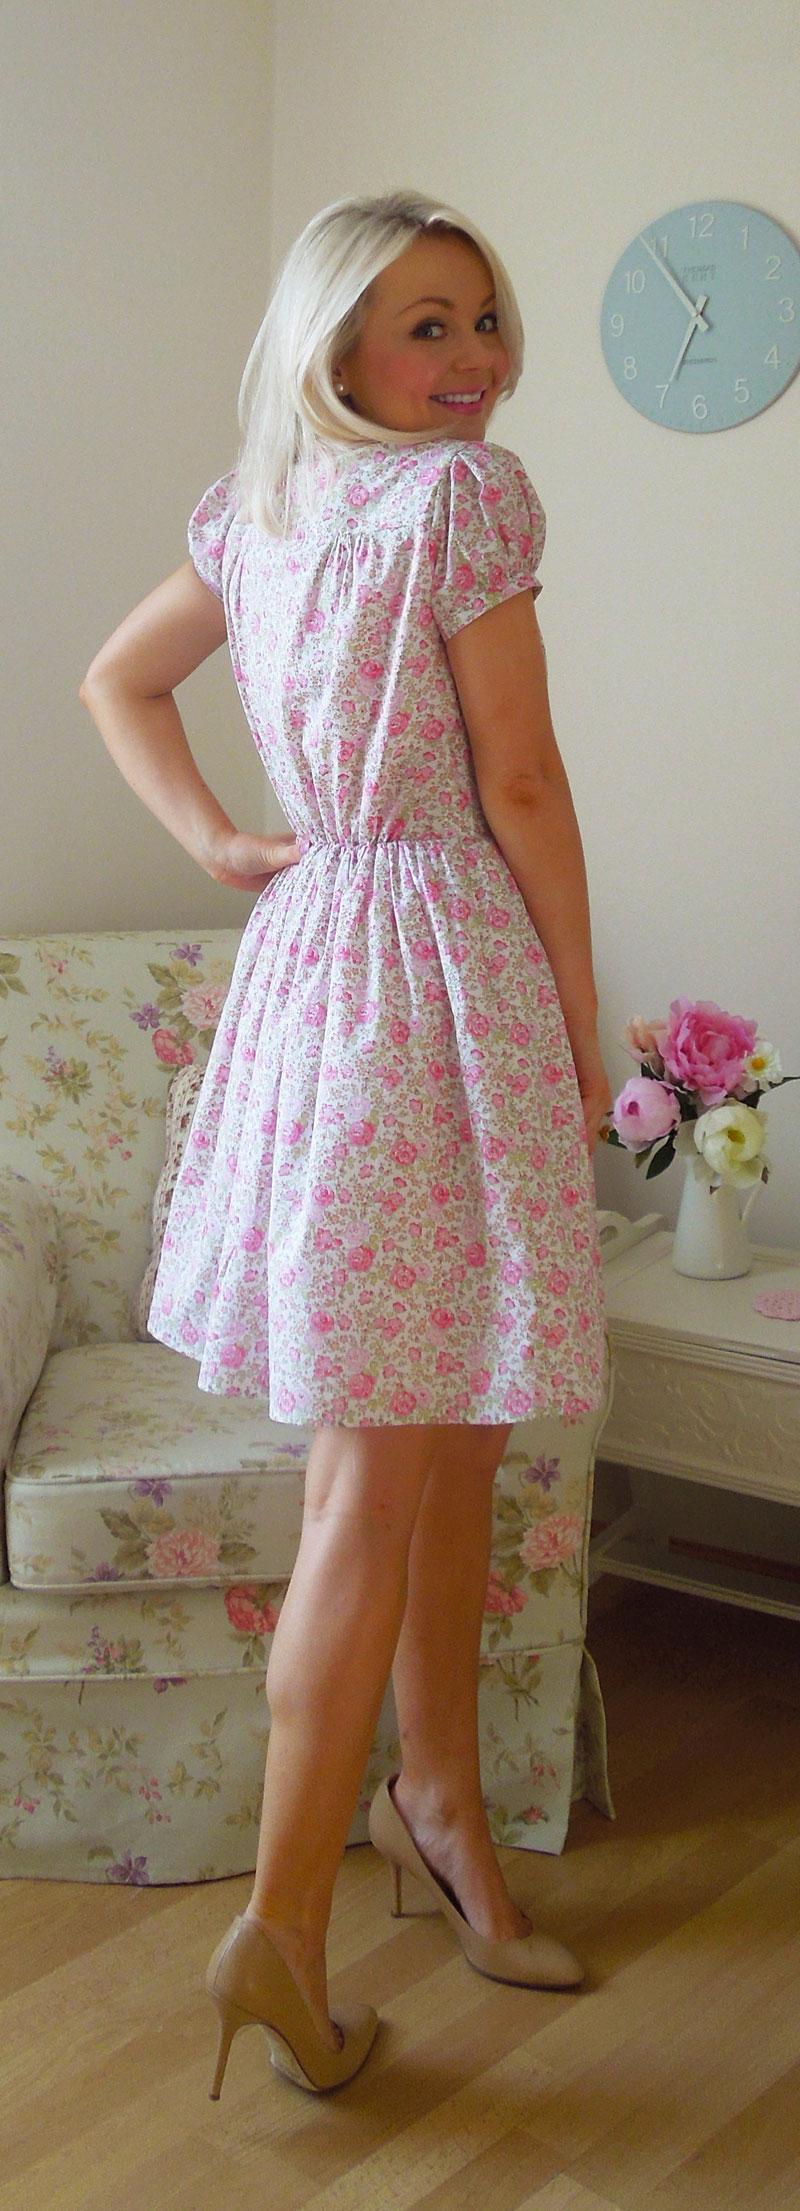 Simplicity 1880 shirt dress